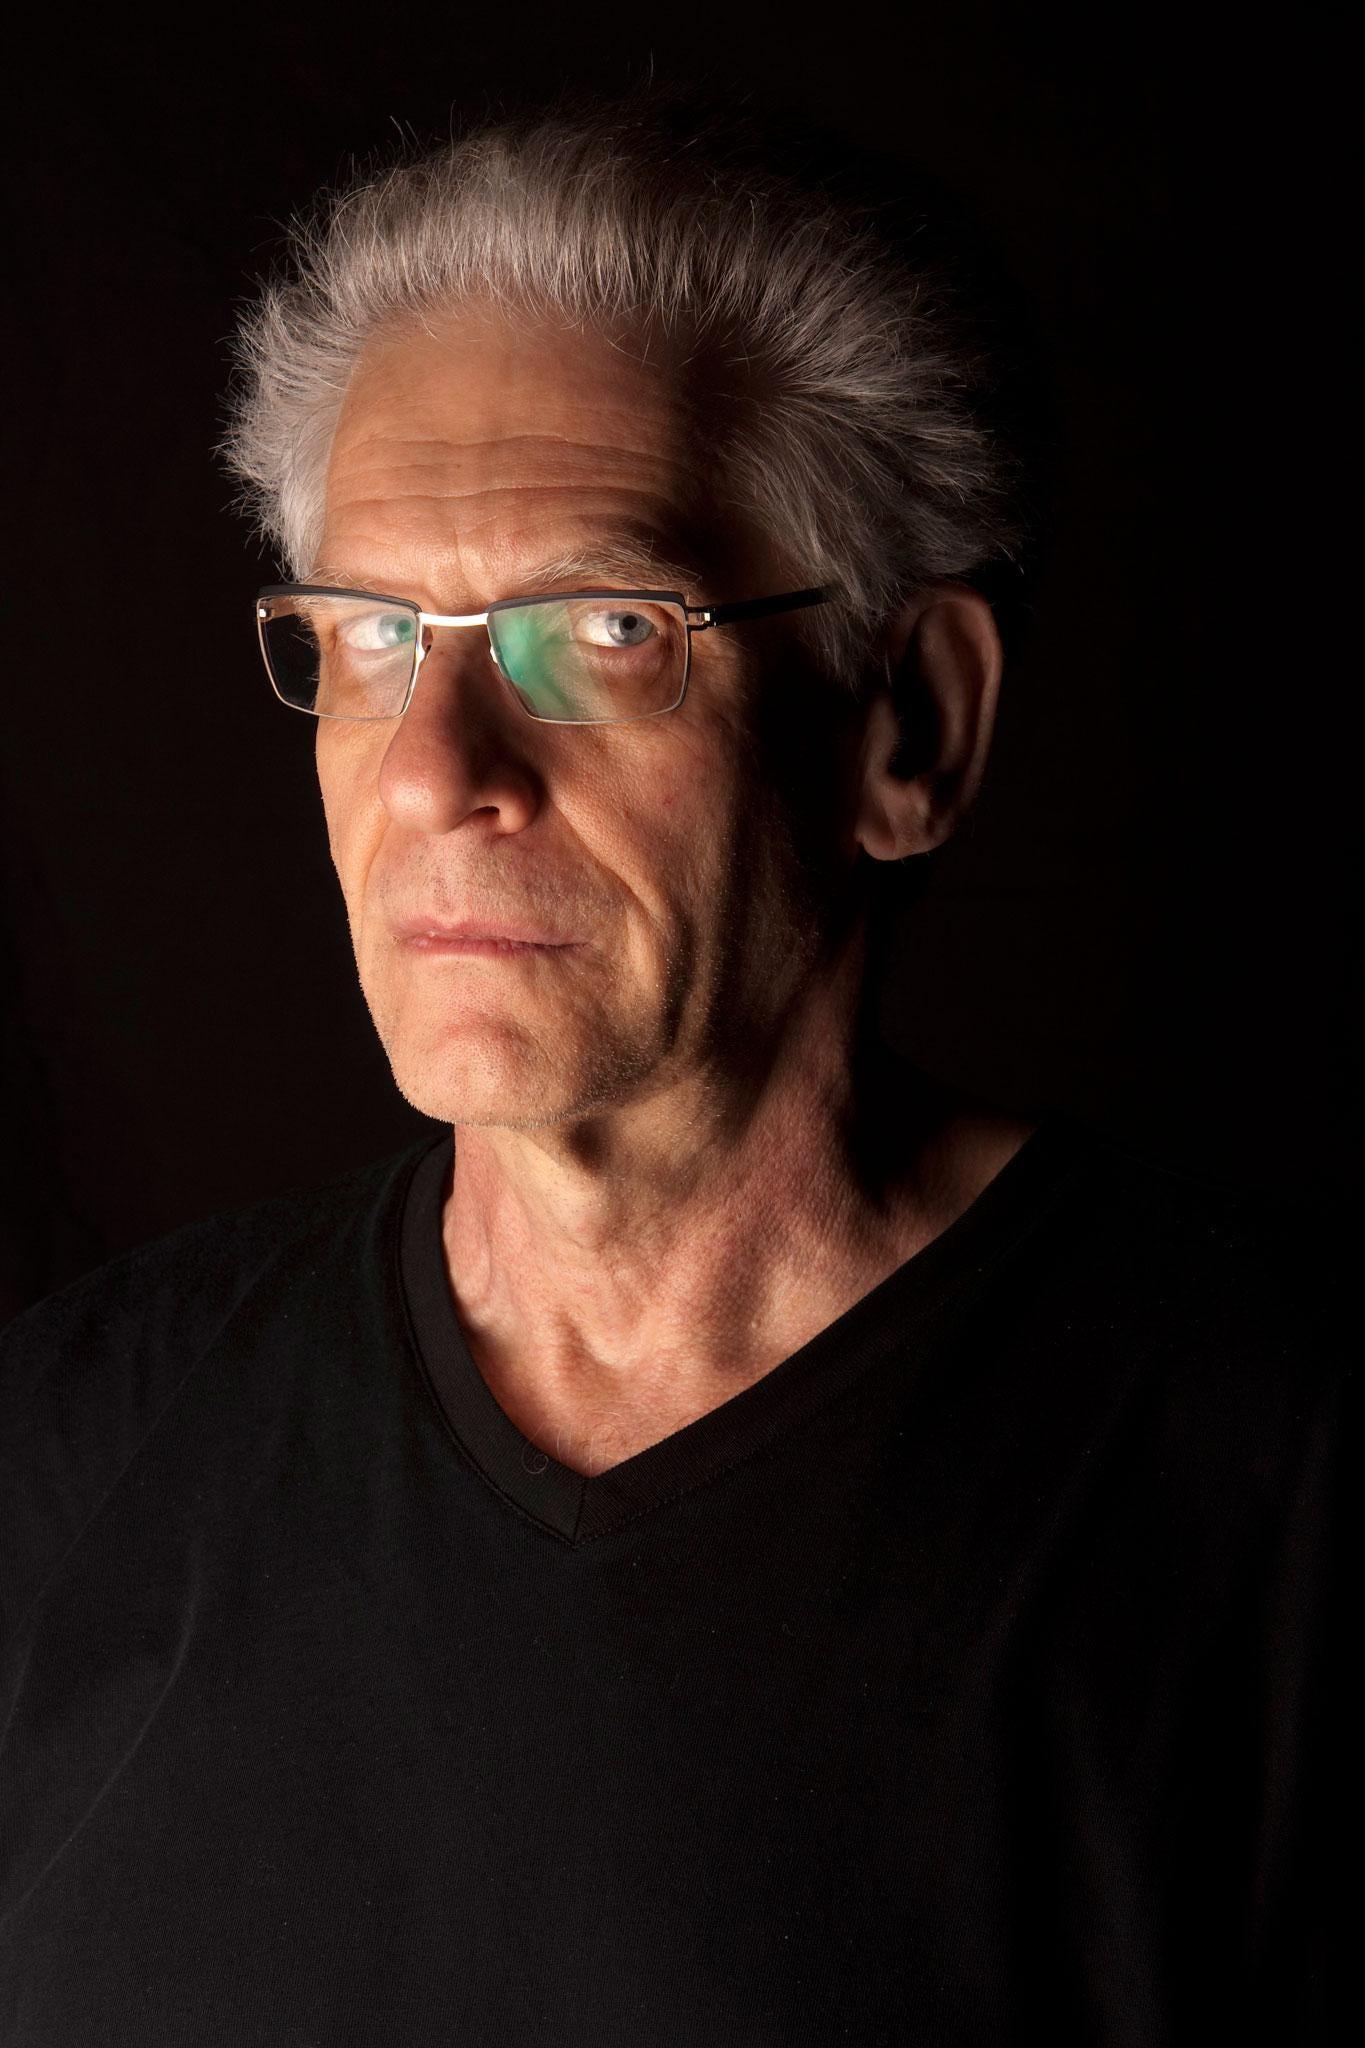 David Cronenberg - film director, screenwriter. The best films of David Cronenberg 58